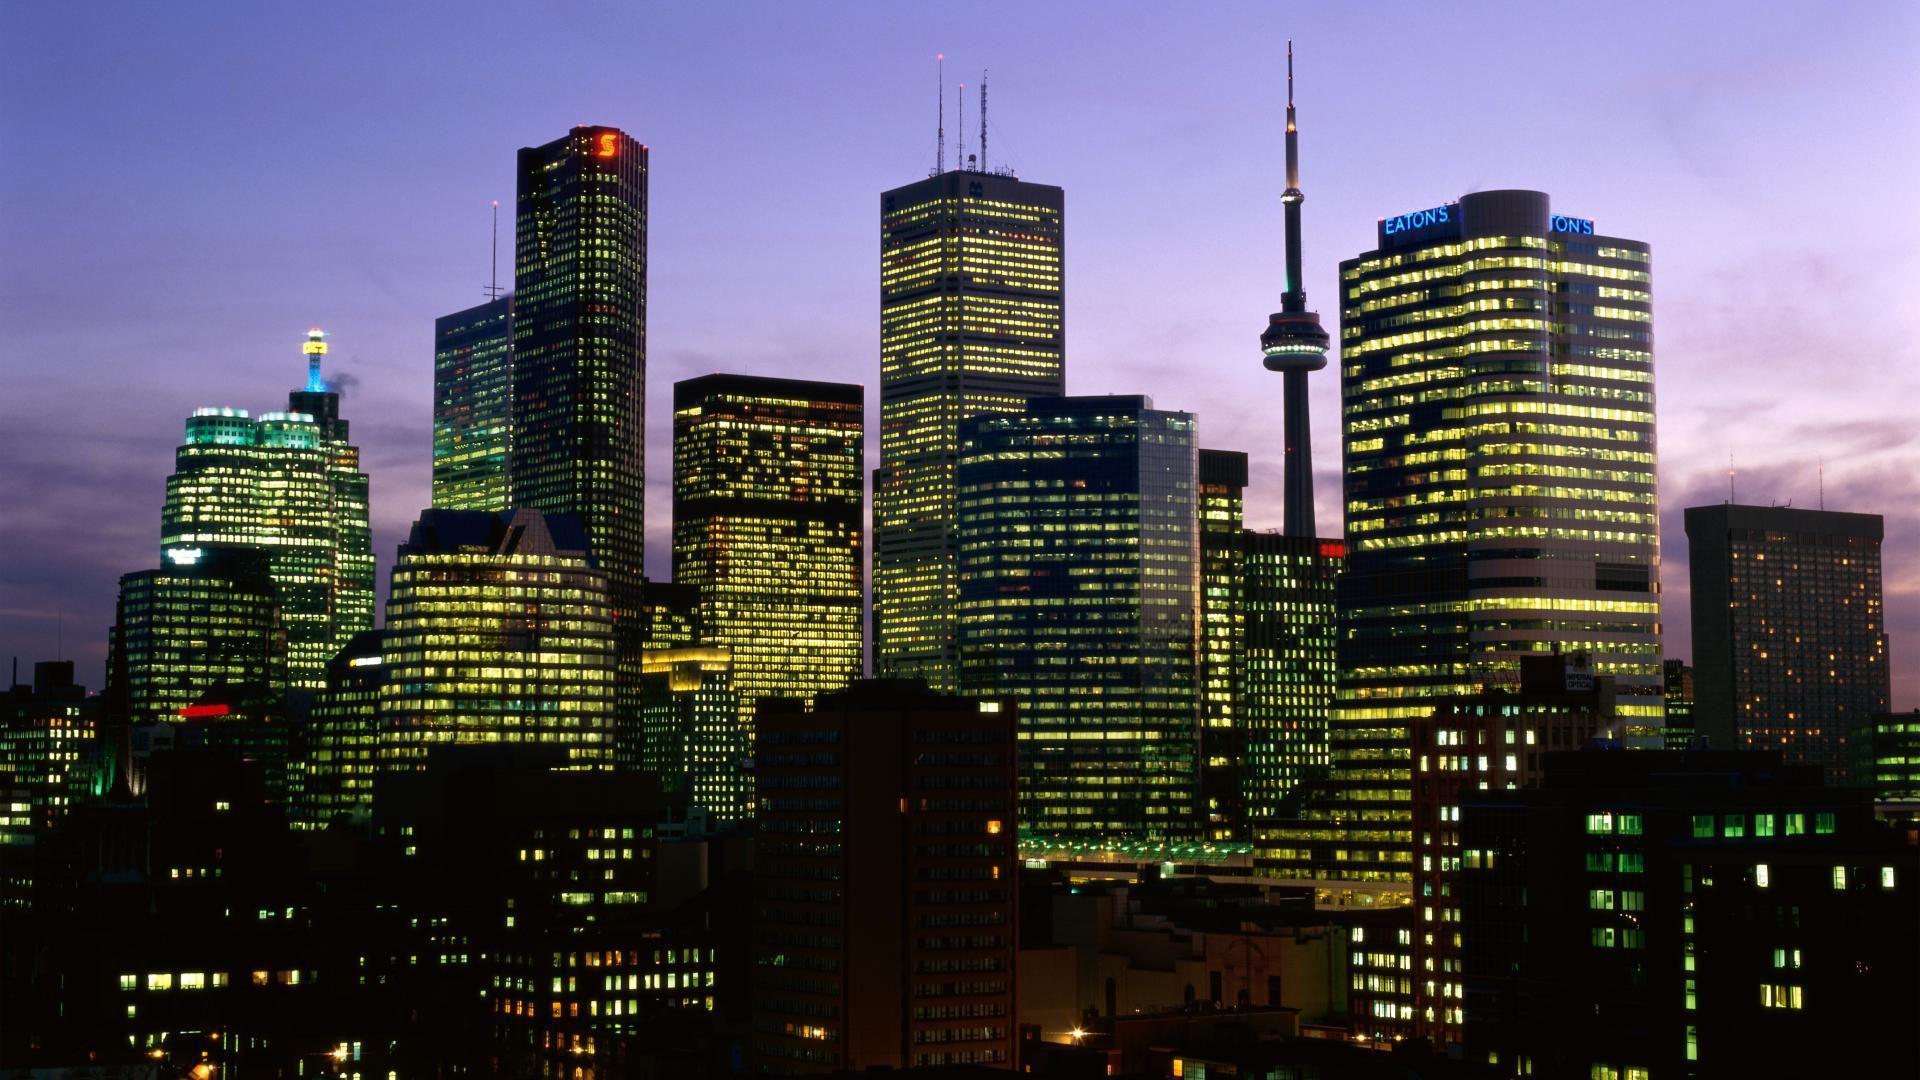 Toronto background wallpaper